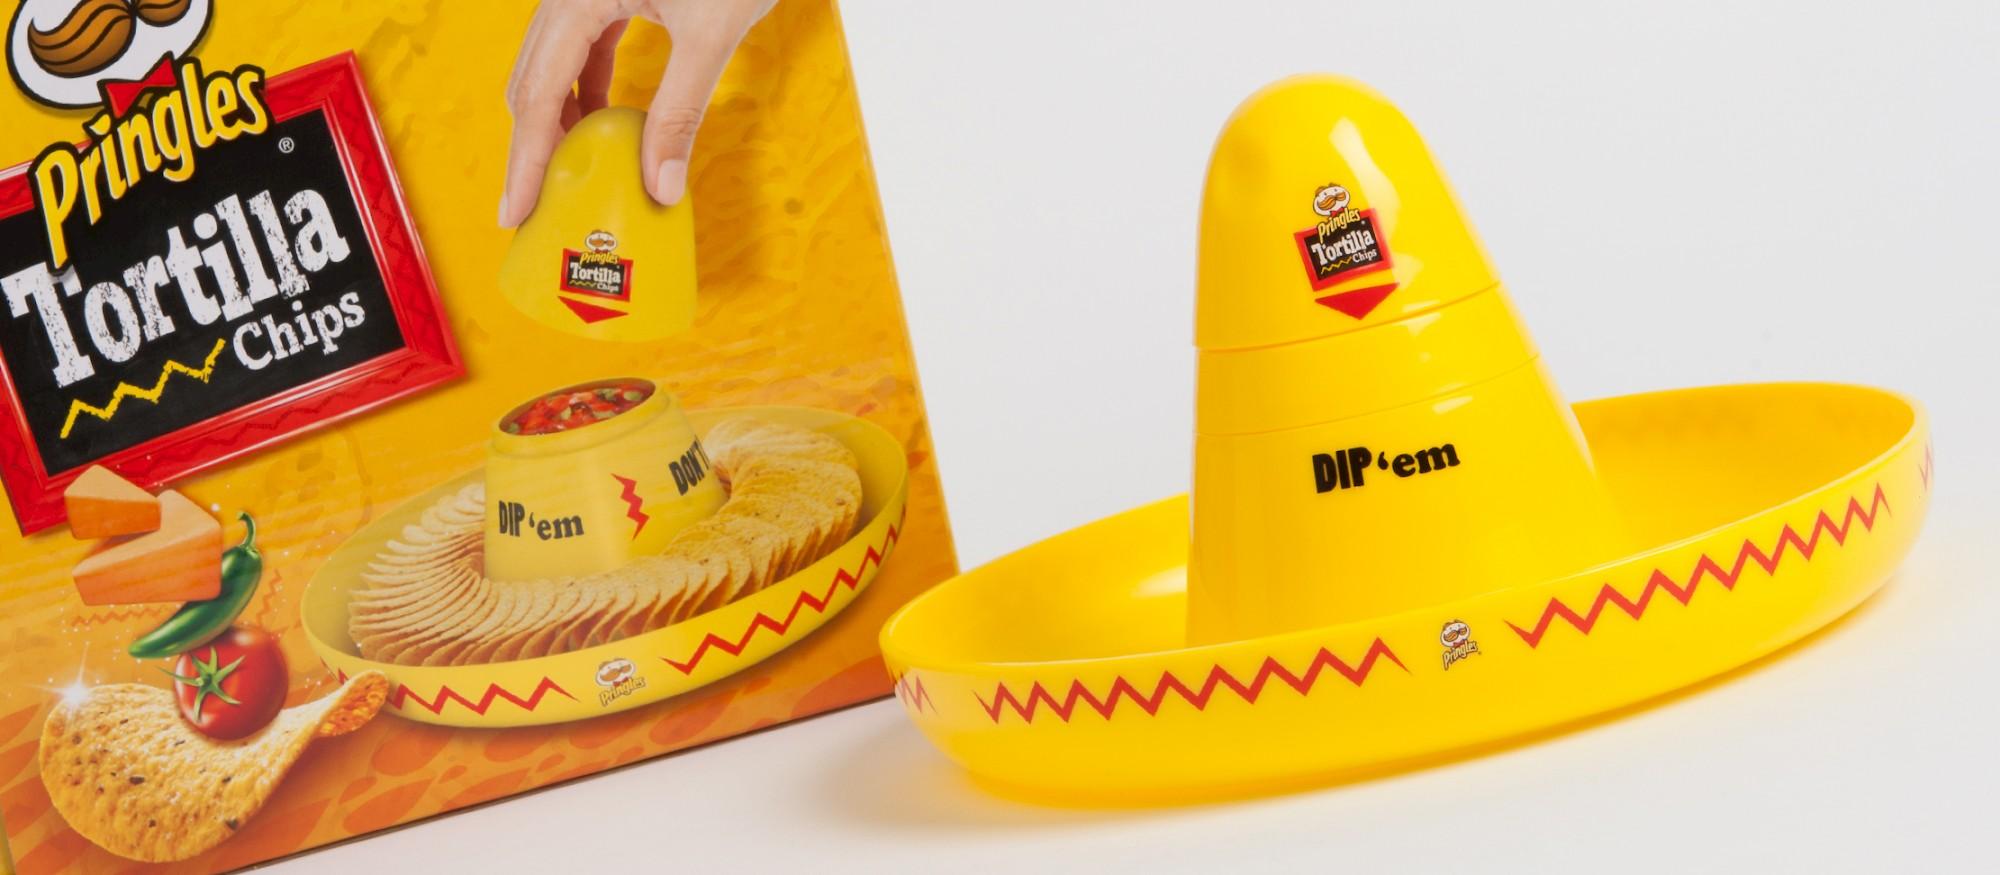 Pringles Tortilla Chips Dip Em Or Dont Maxx Marketing